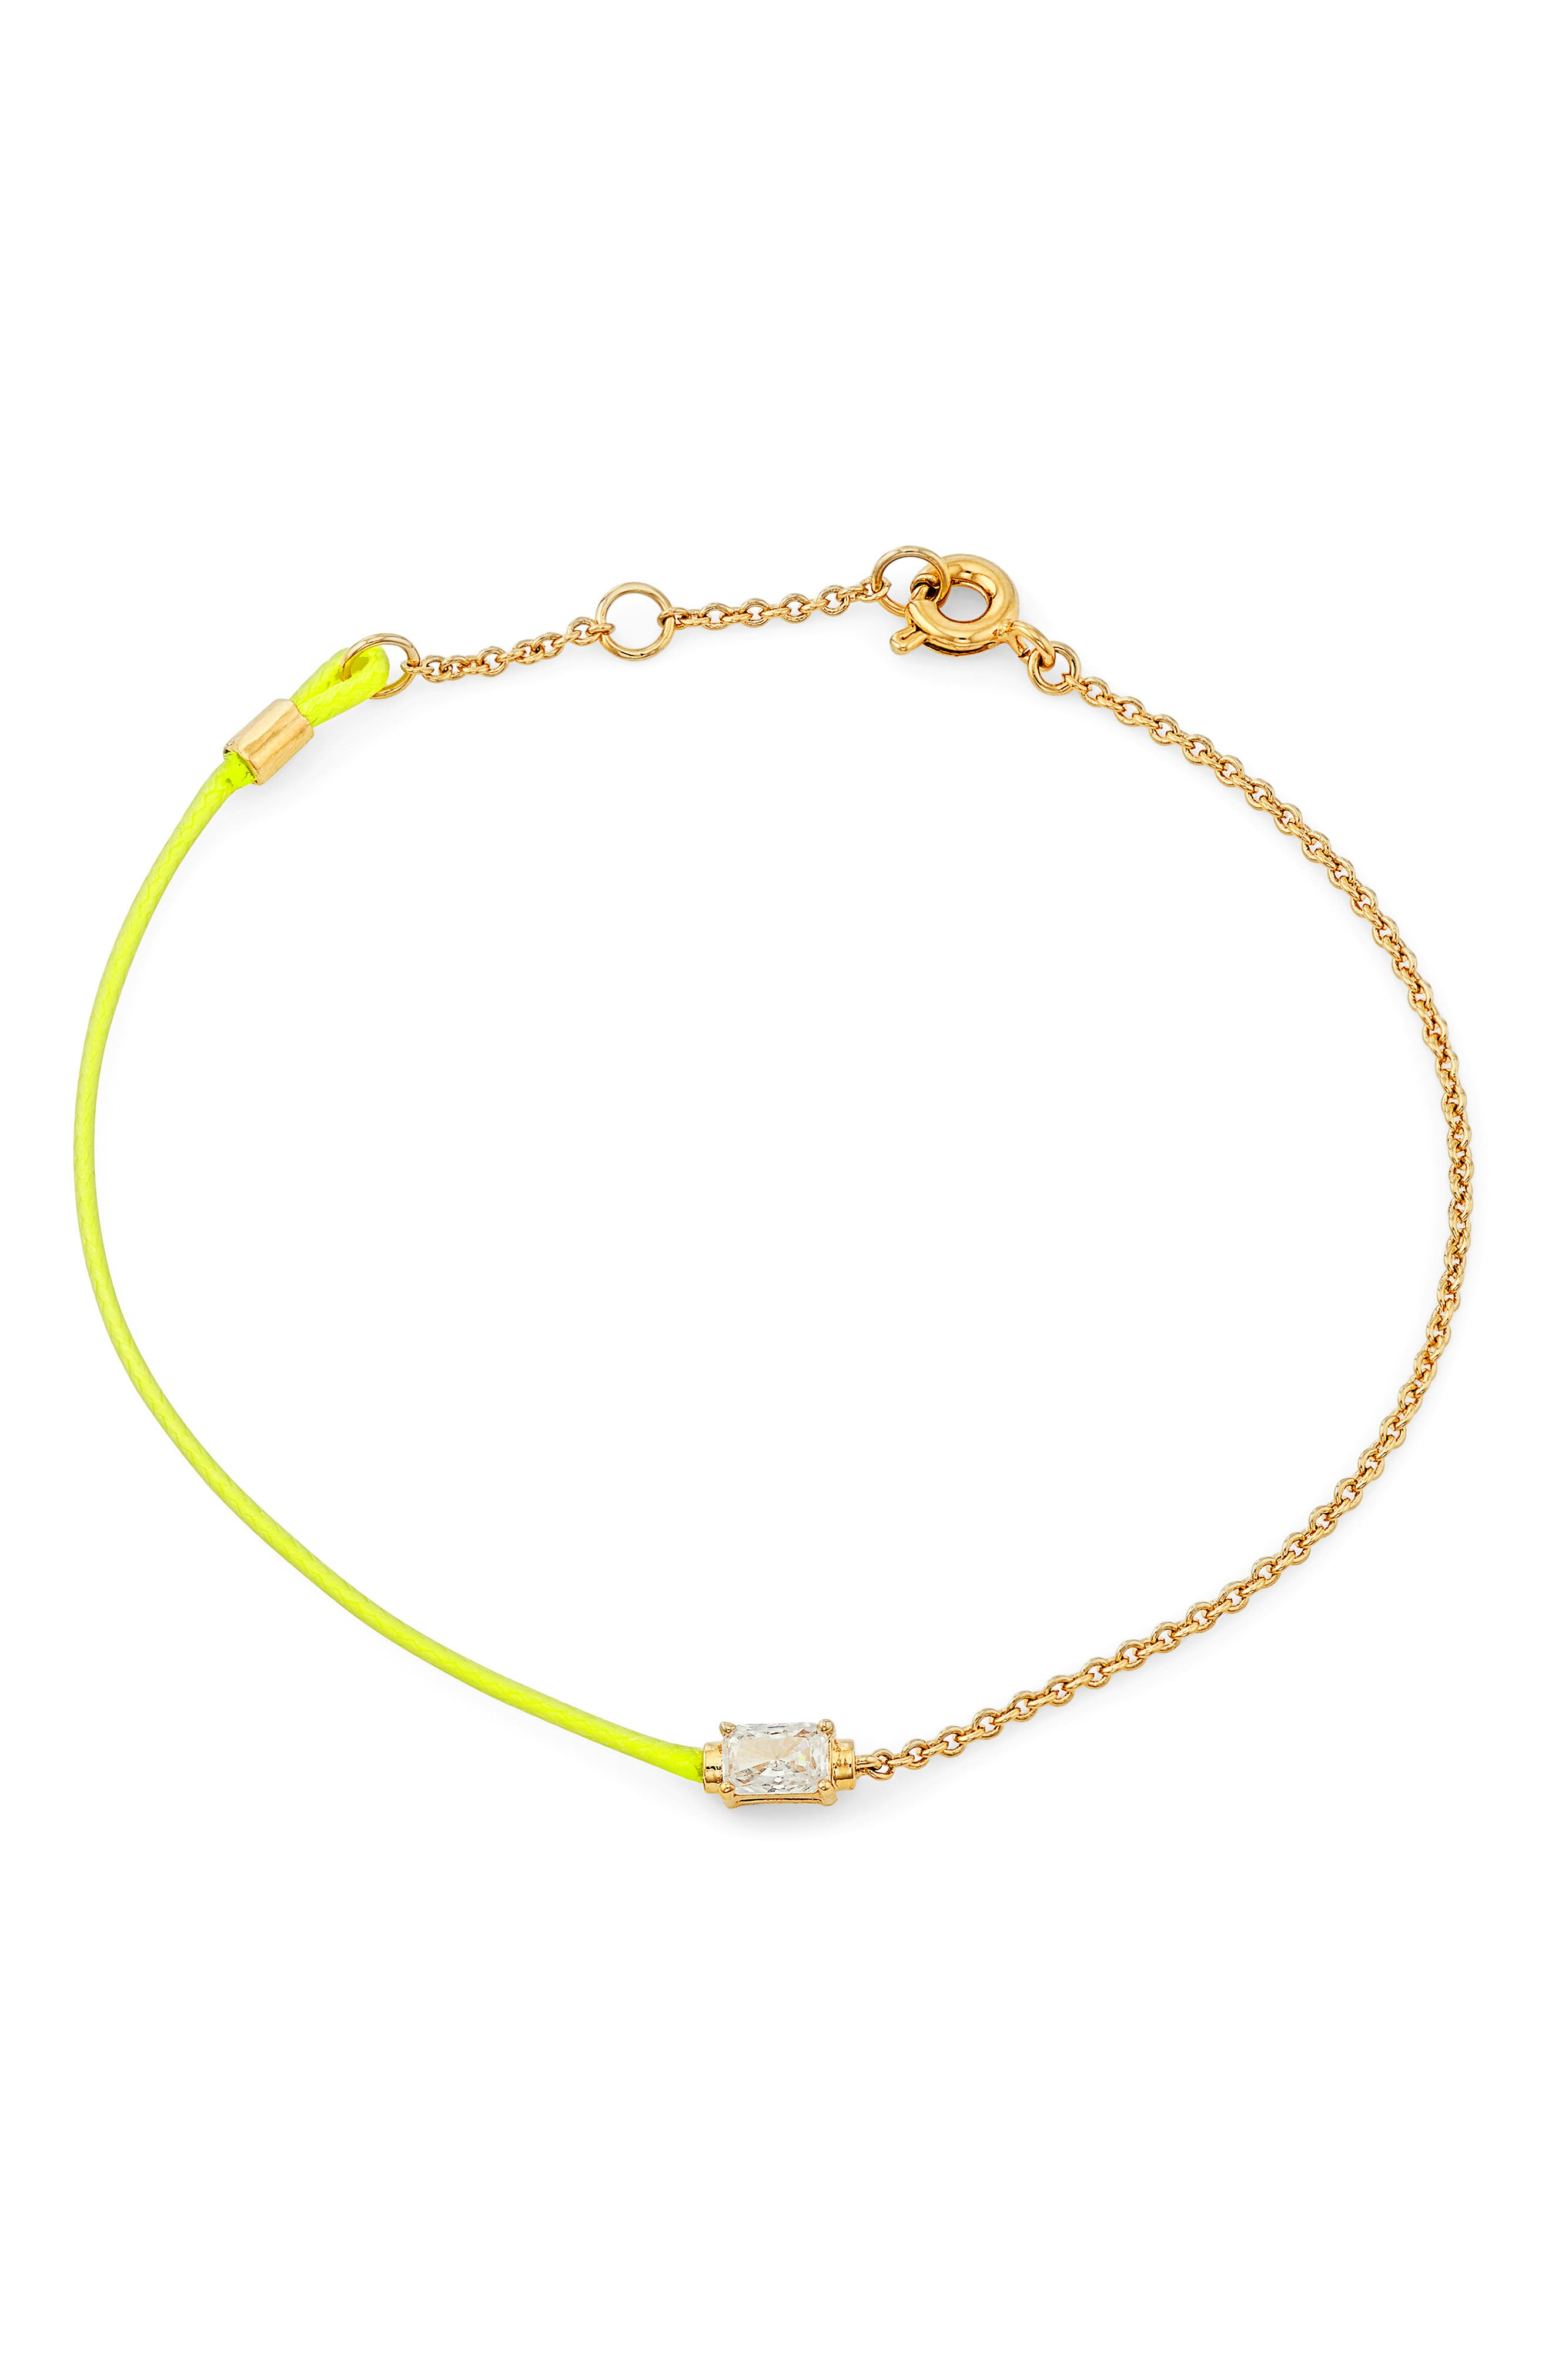 Cubic Zirconia Cord Bracelet